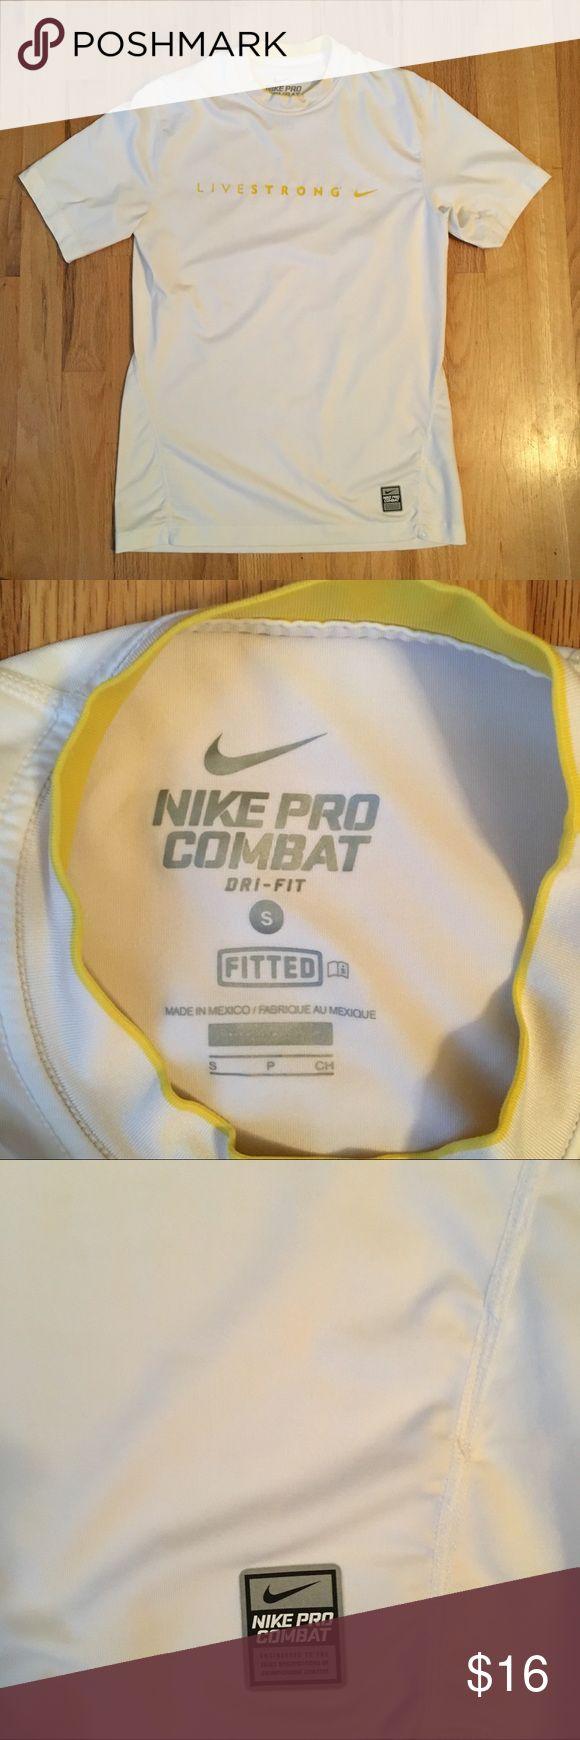 Livestrong Nike dry-fit S Nike pro combat. Nike Shirts Tees - Short Sleeve